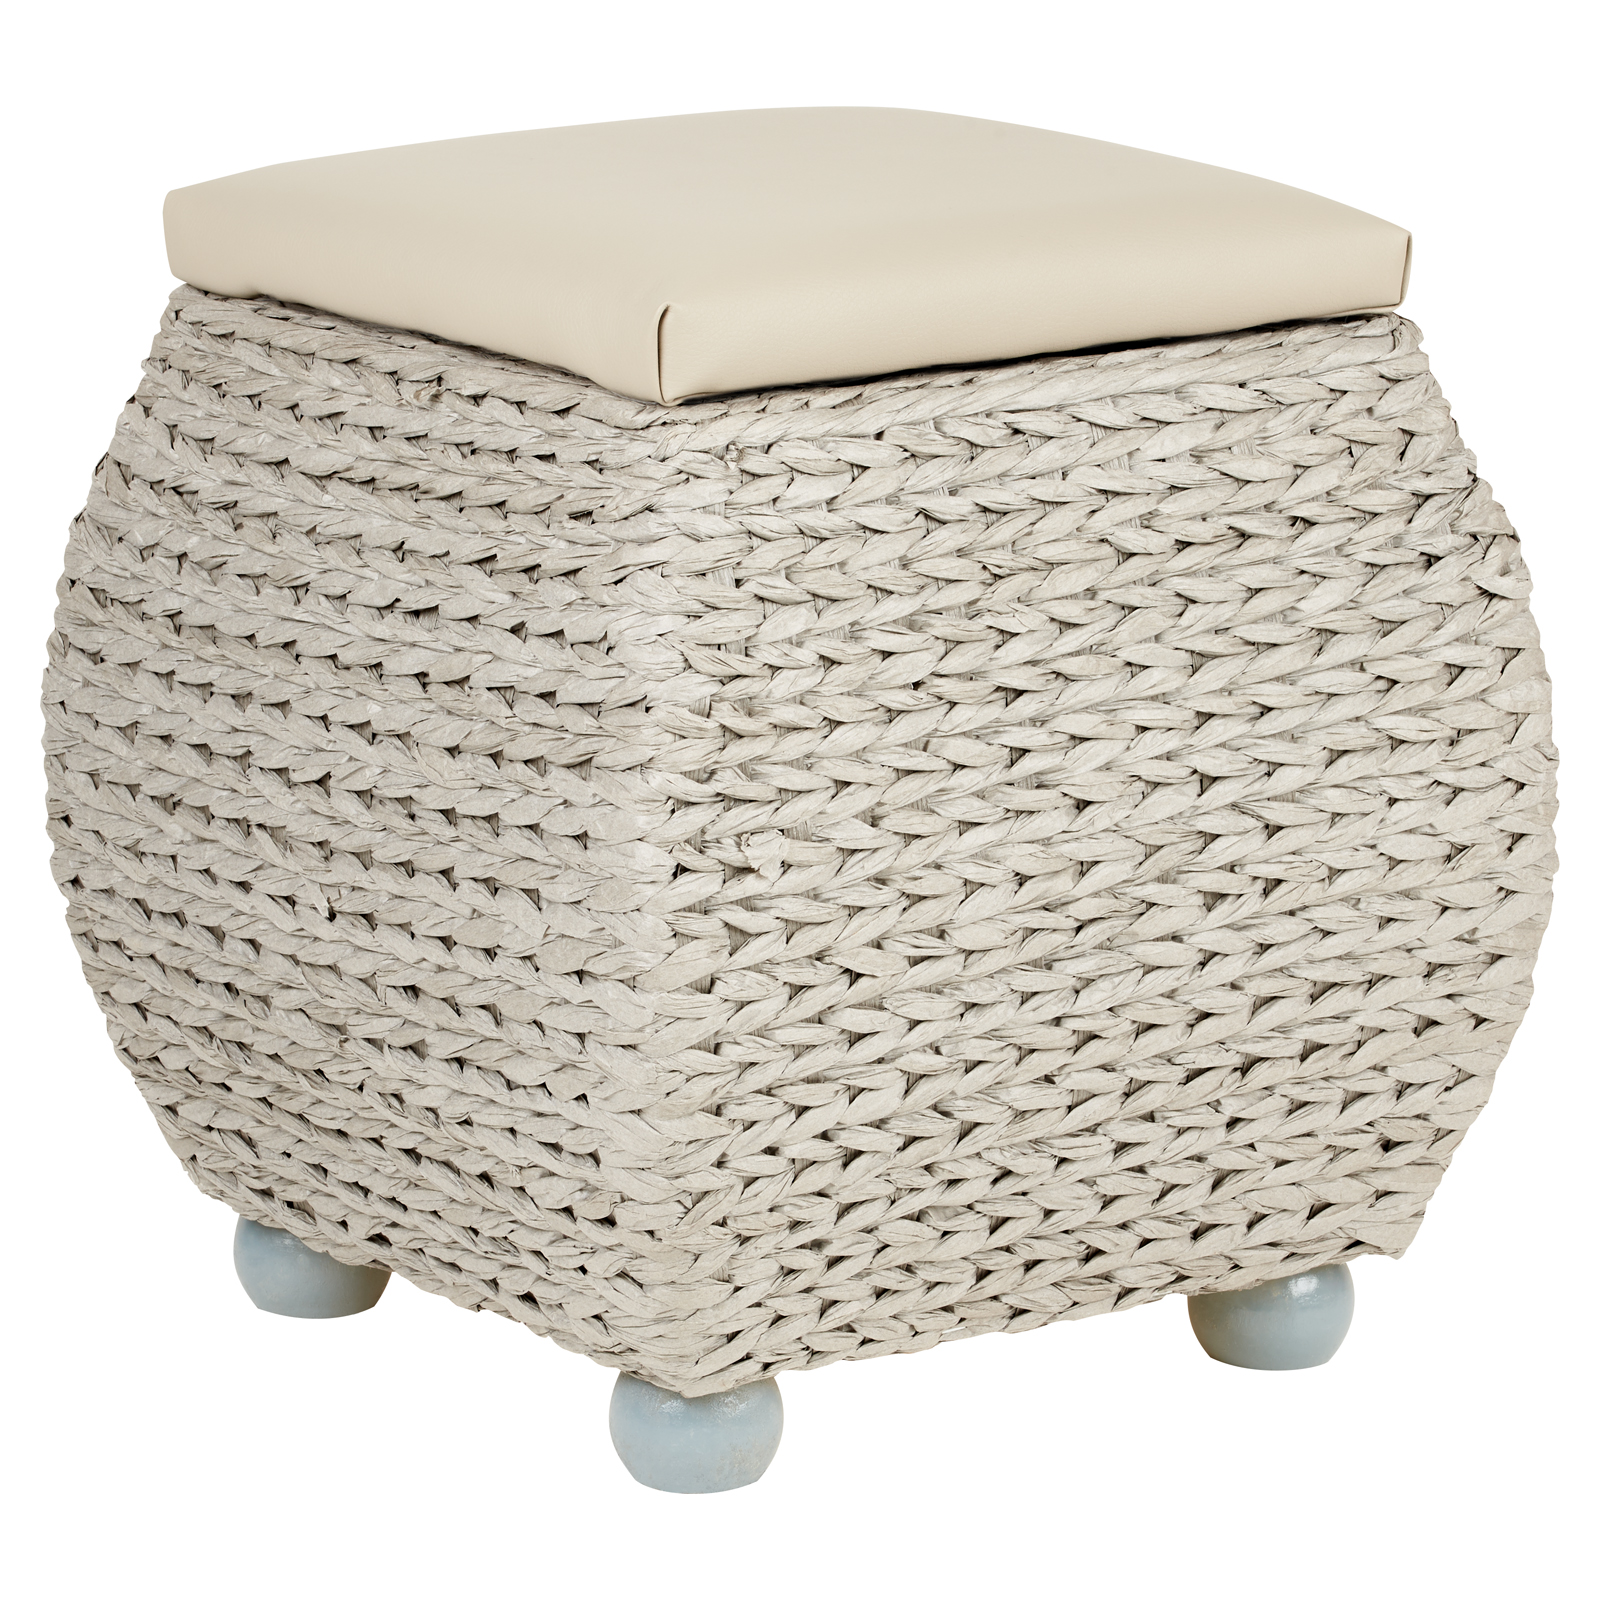 Sentinel hartleys small grey storage ottoman footstool bench pouffe toy trunk box